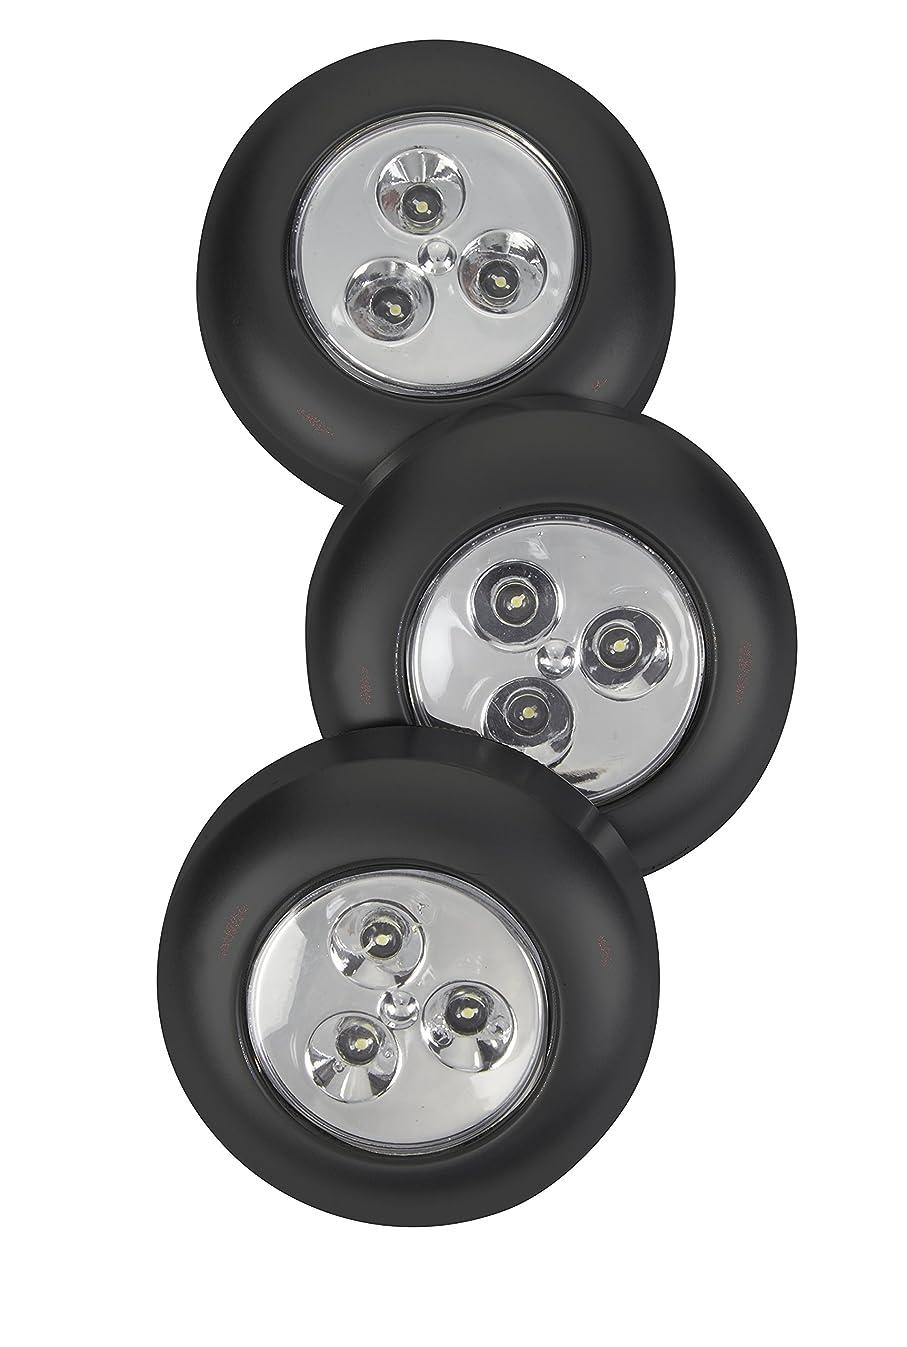 LIGHT IT by Fulcrum 30010-303 3 LED Wireless Stick-On Tap Light, 3 Pack, Black